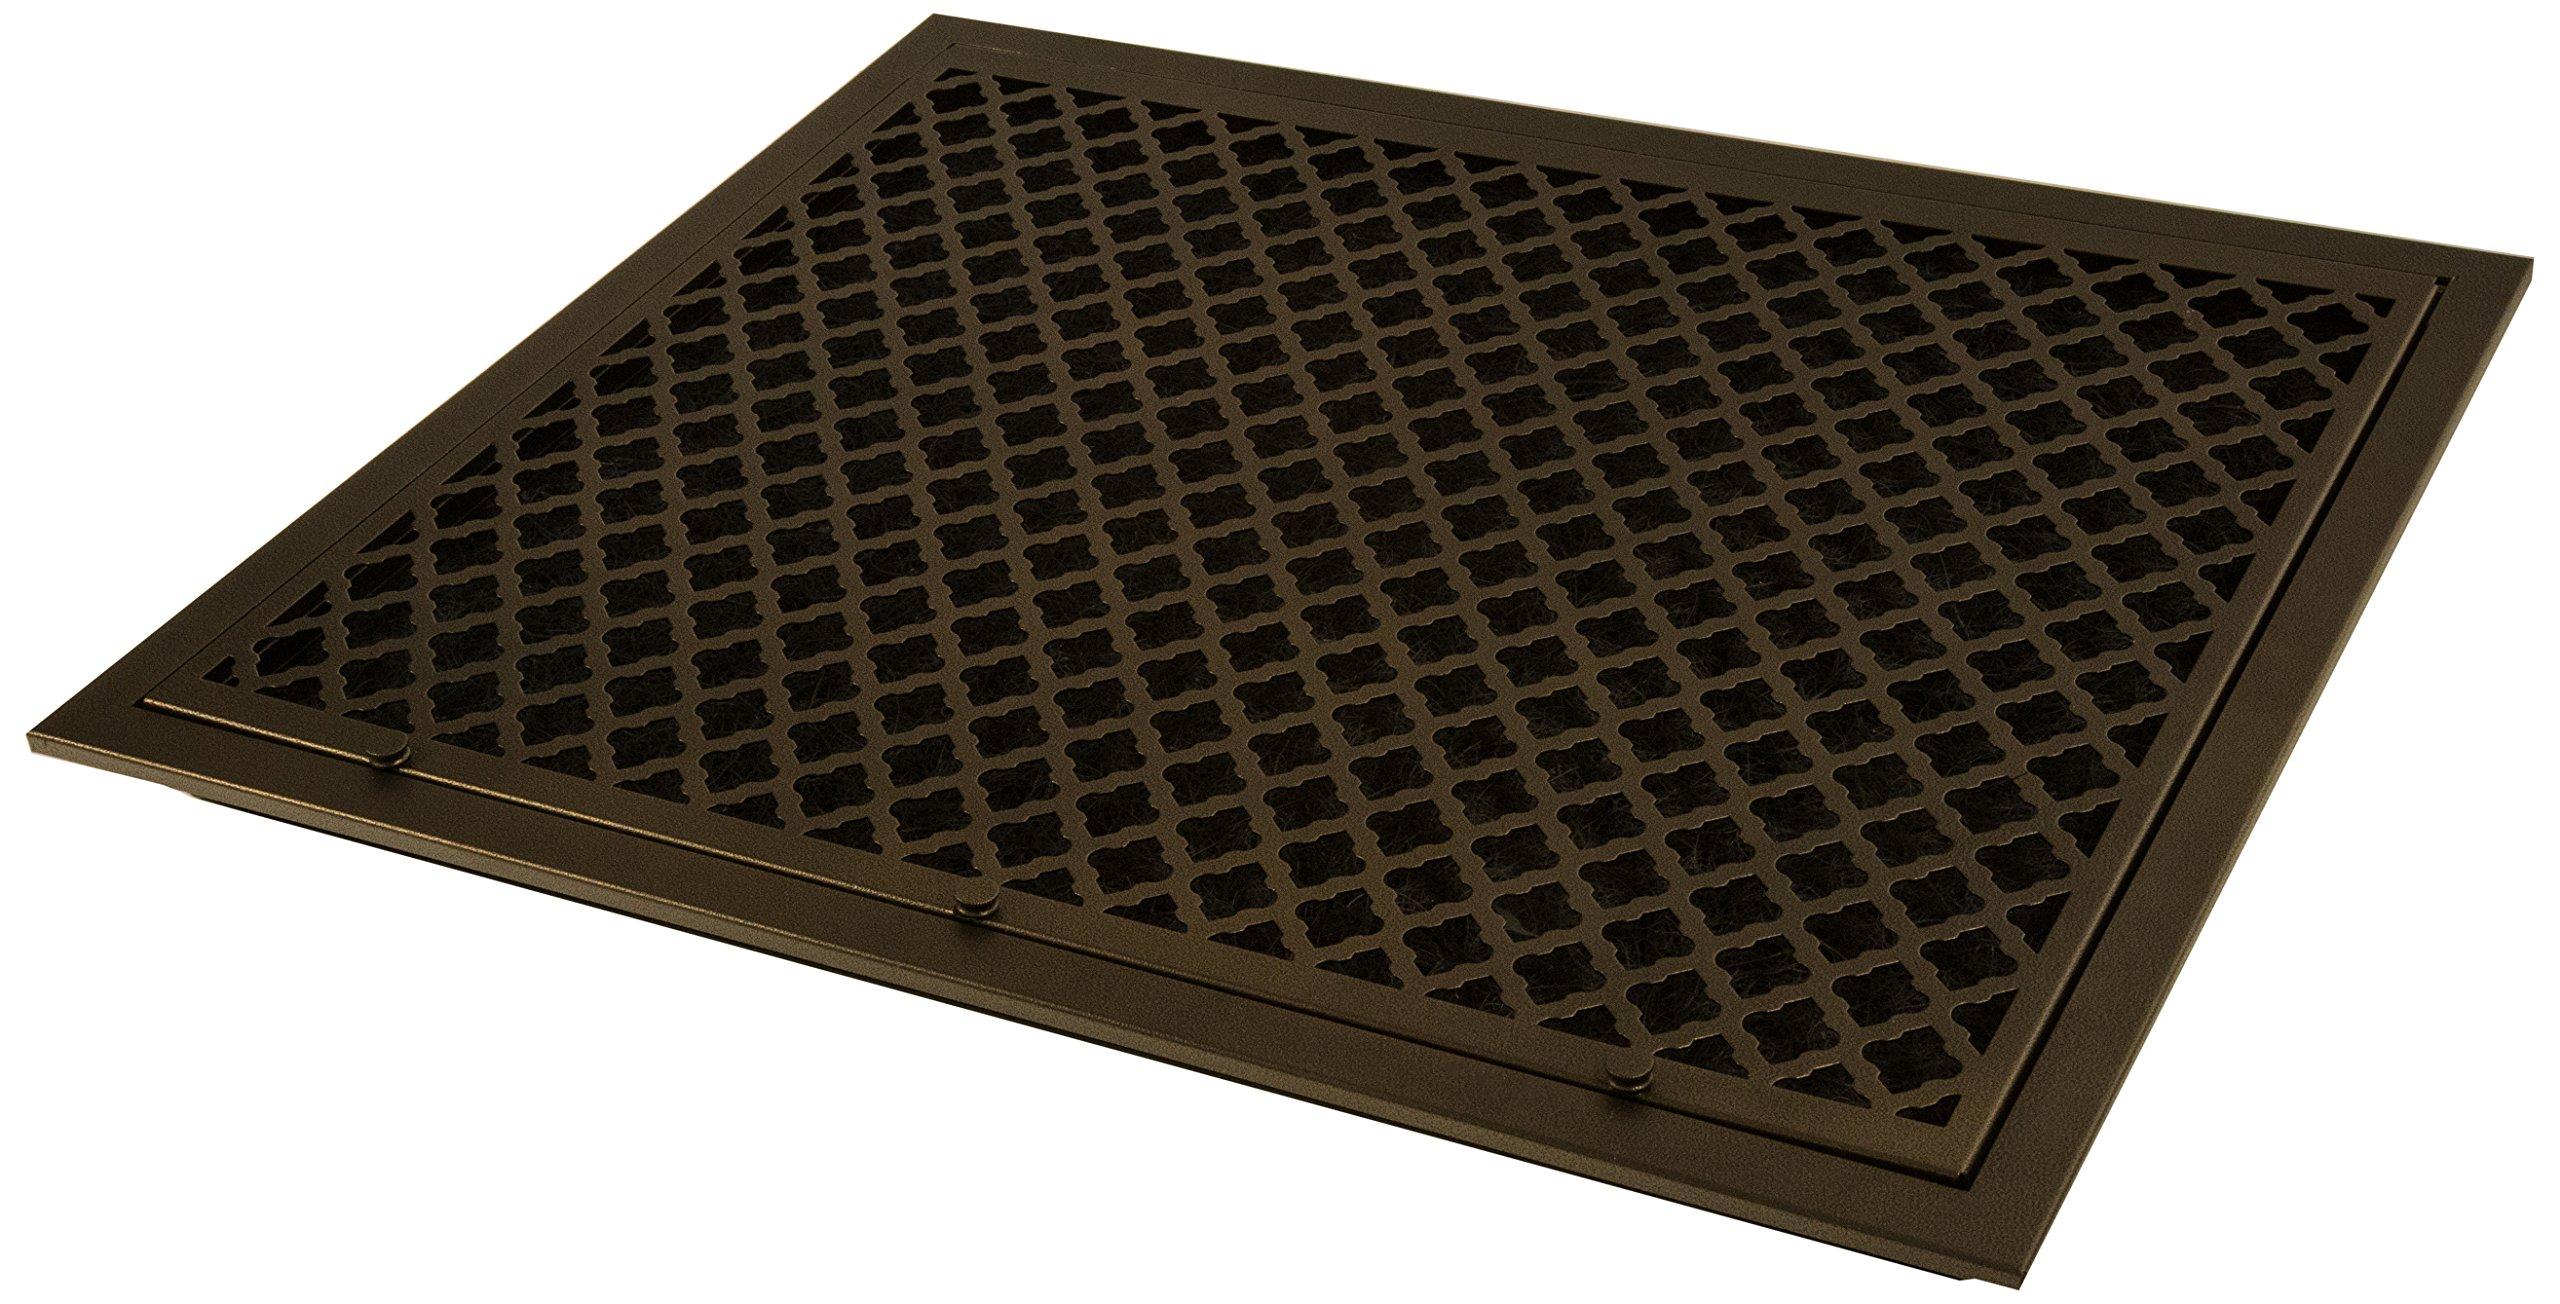 SteelCrest BTU25X20FFORB Bronze Series Designer Filter Return Vent with Hinged Door, Oil Rubbed Bronze